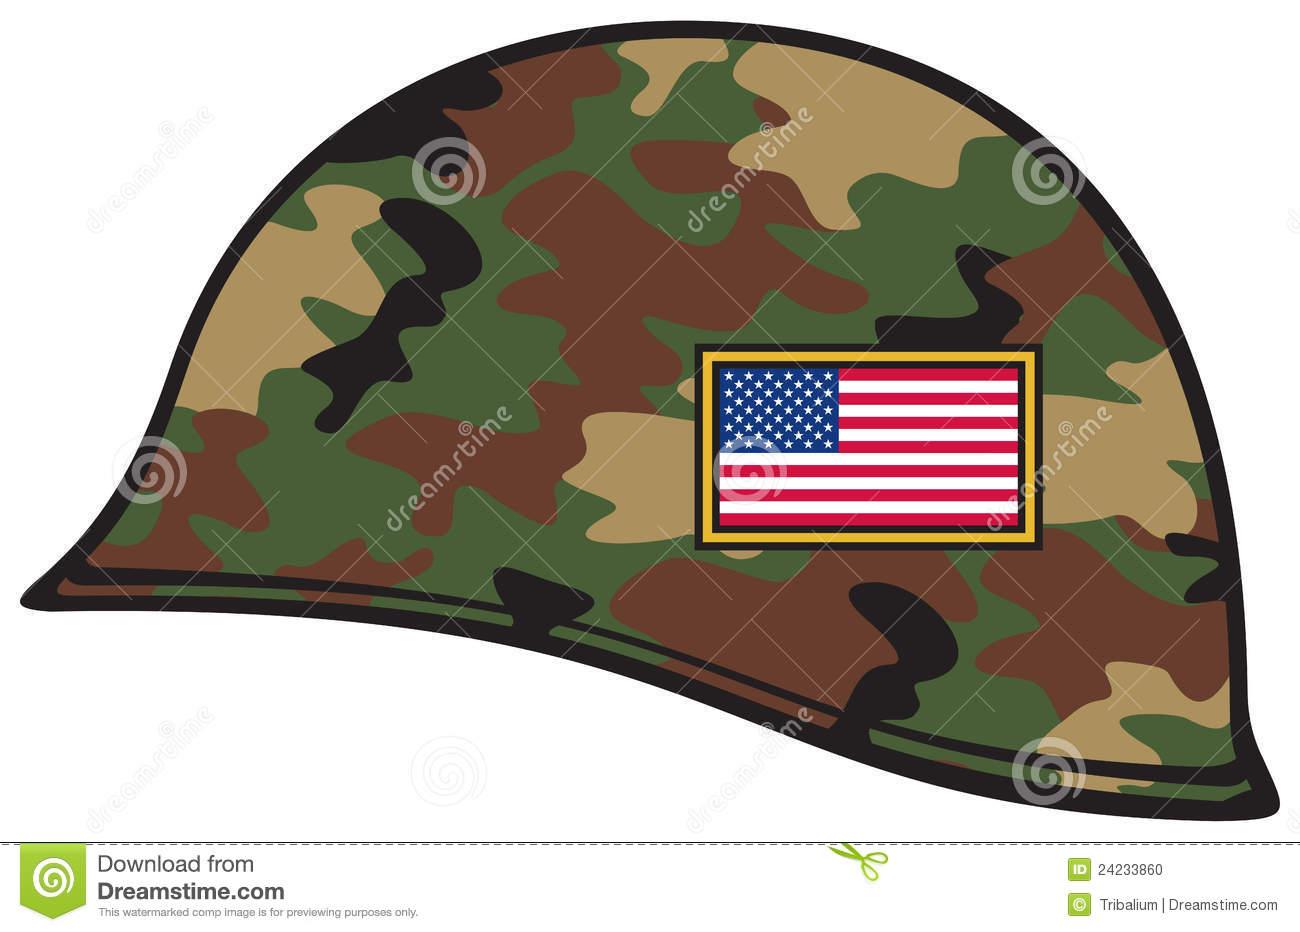 Army clipart army cap #13